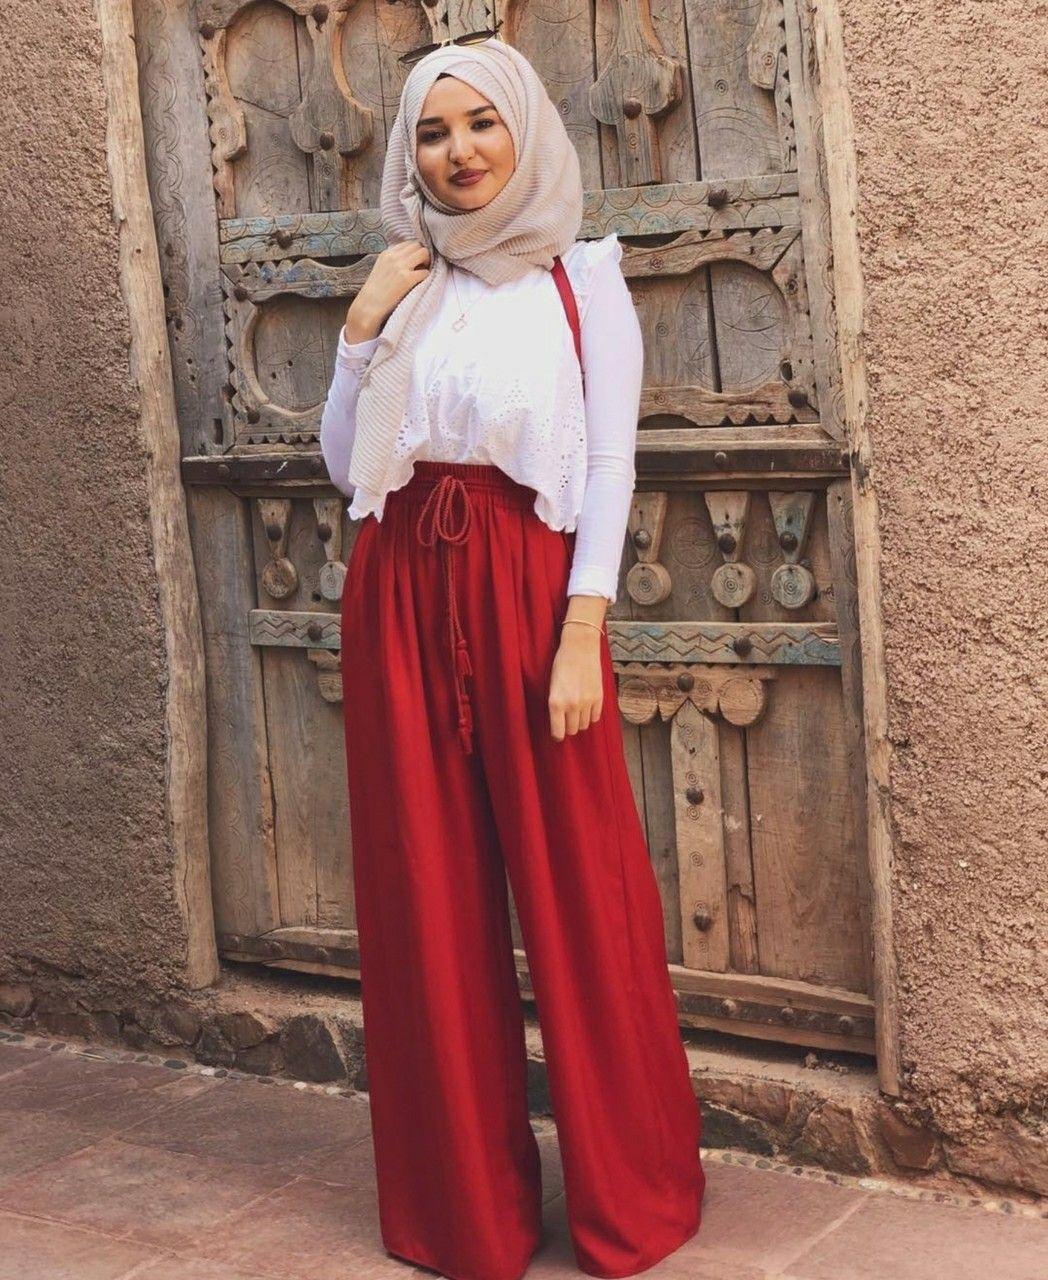 20+ Beautiful Hijab Style Ideas For 2021 - InspiringMesh